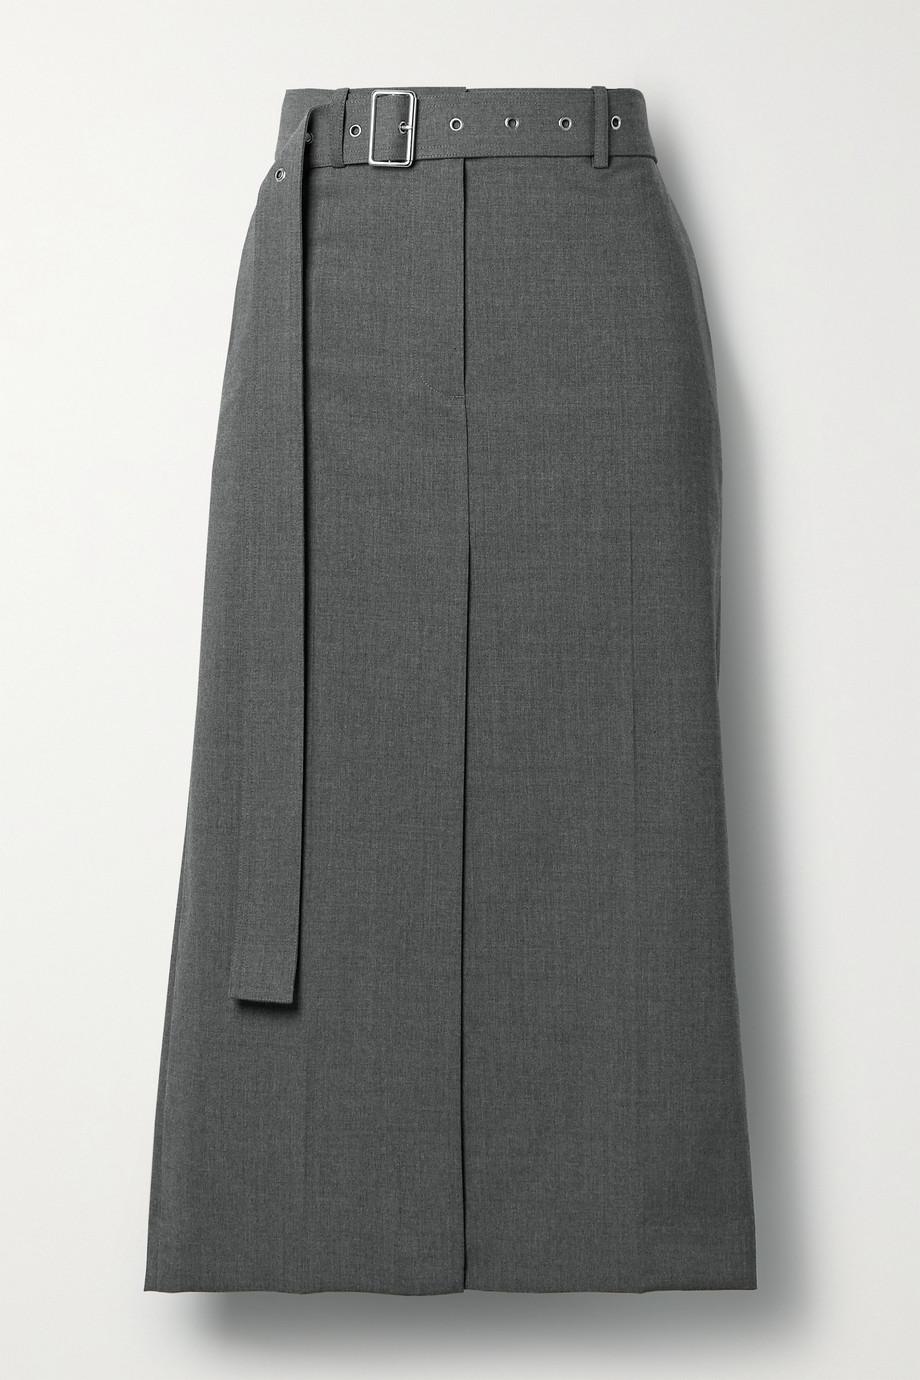 Helmut Lang Belted wool-blend midi skirt